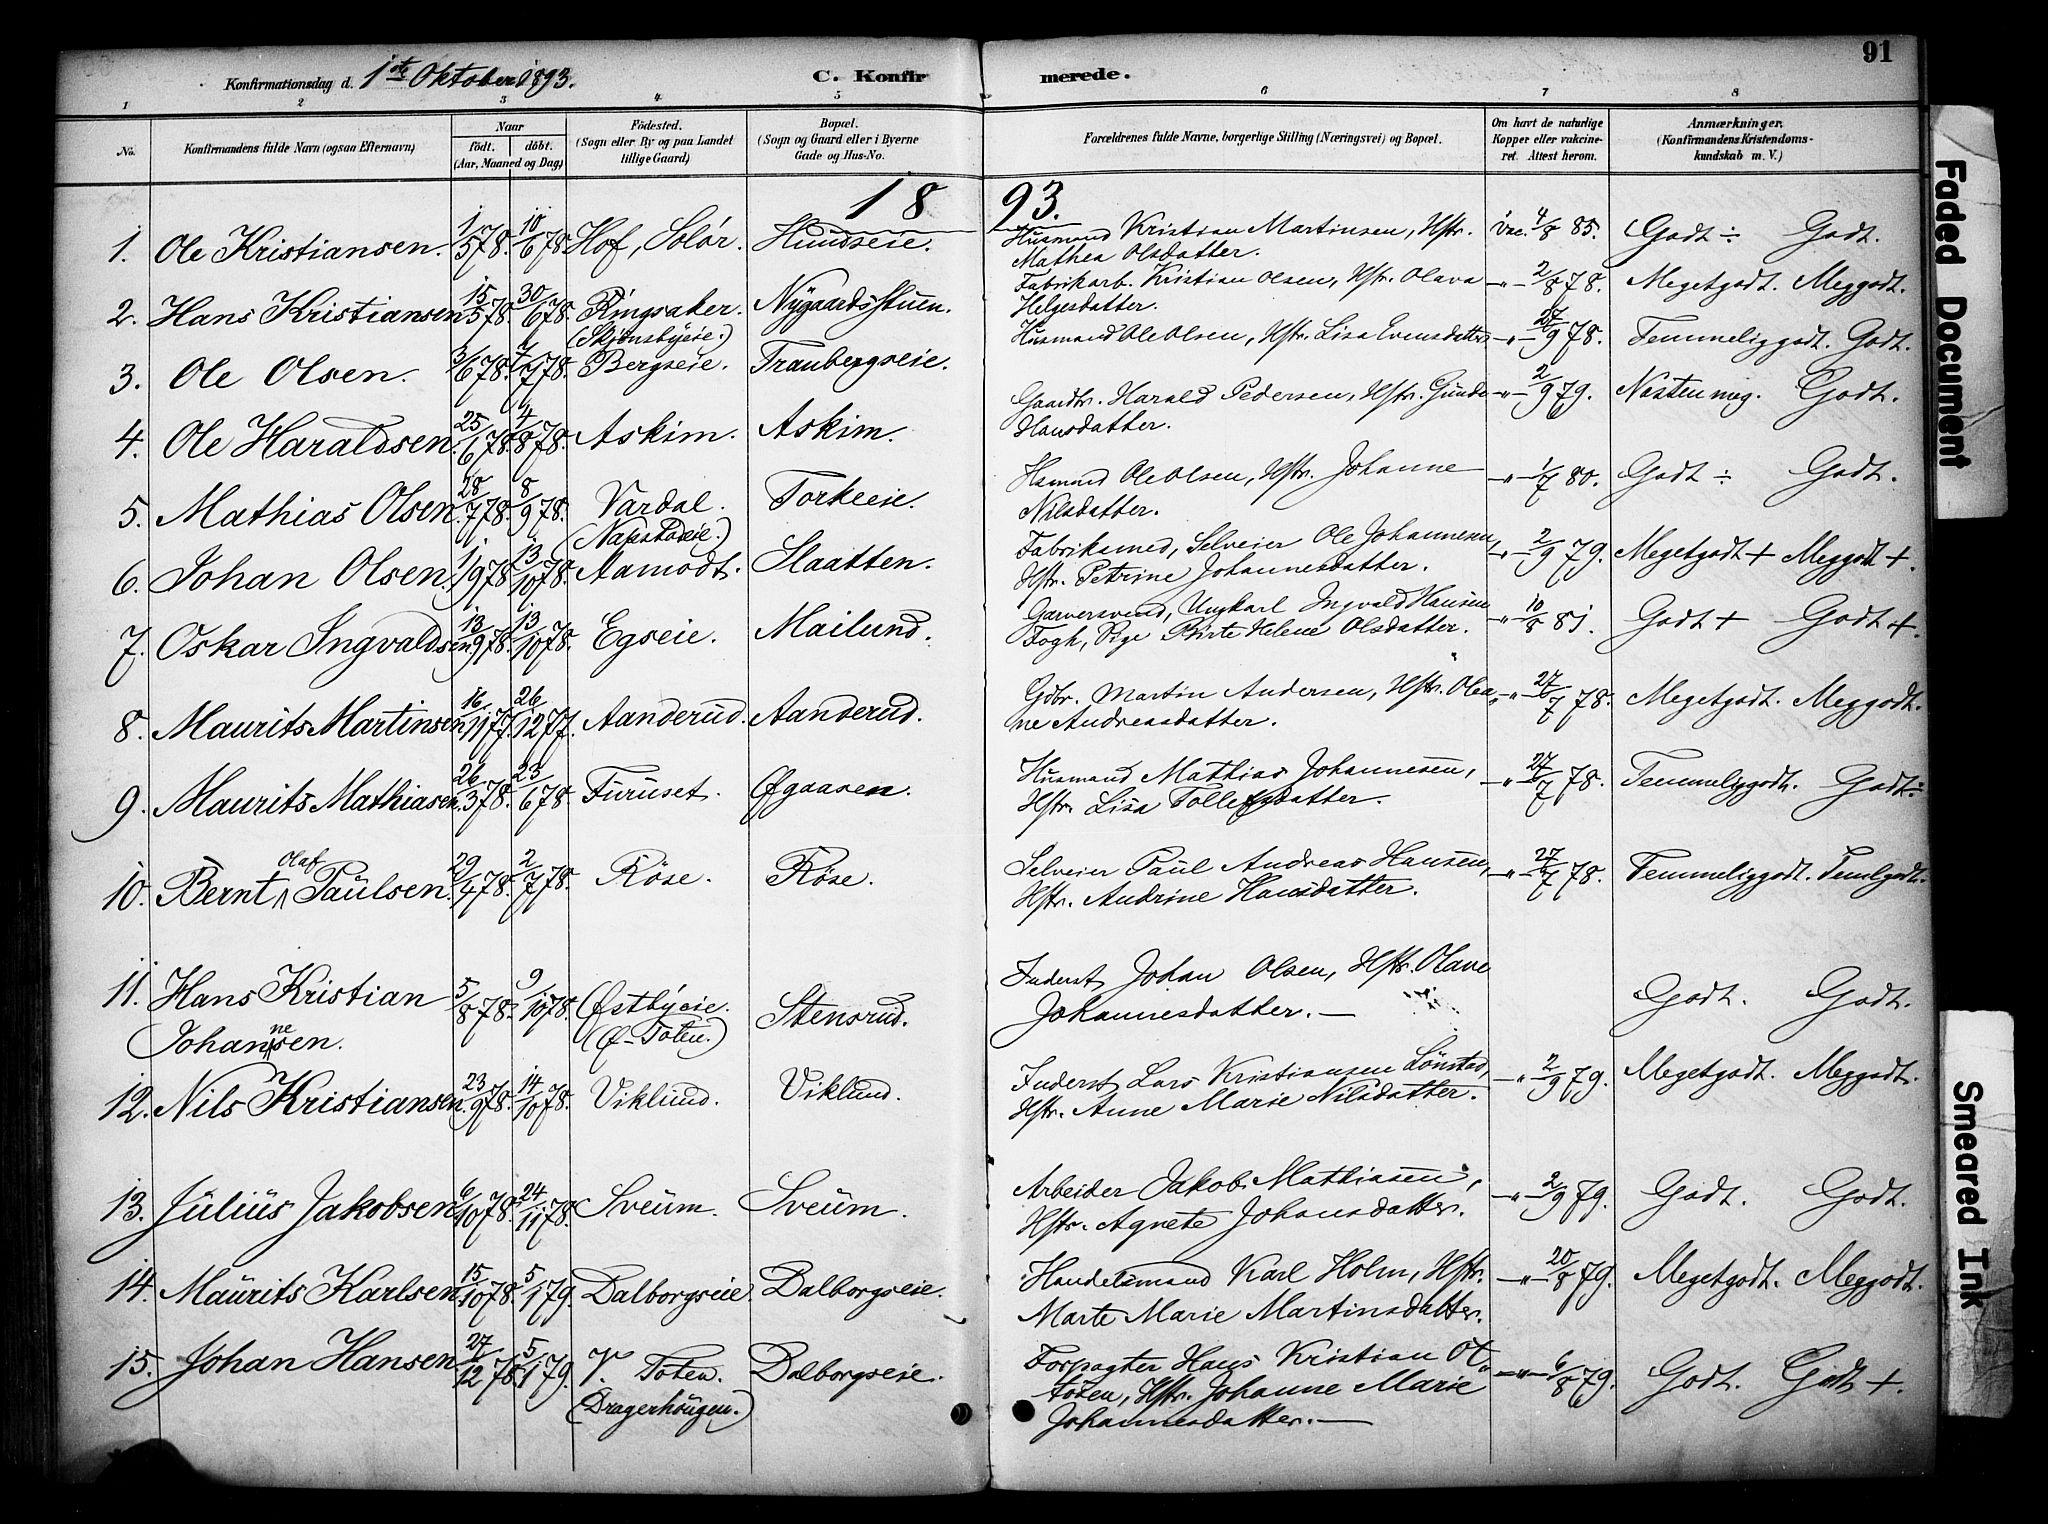 SAH, Vardal prestekontor, H/Ha/Haa/L0012: Ministerialbok nr. 12, 1893-1904, s. 91